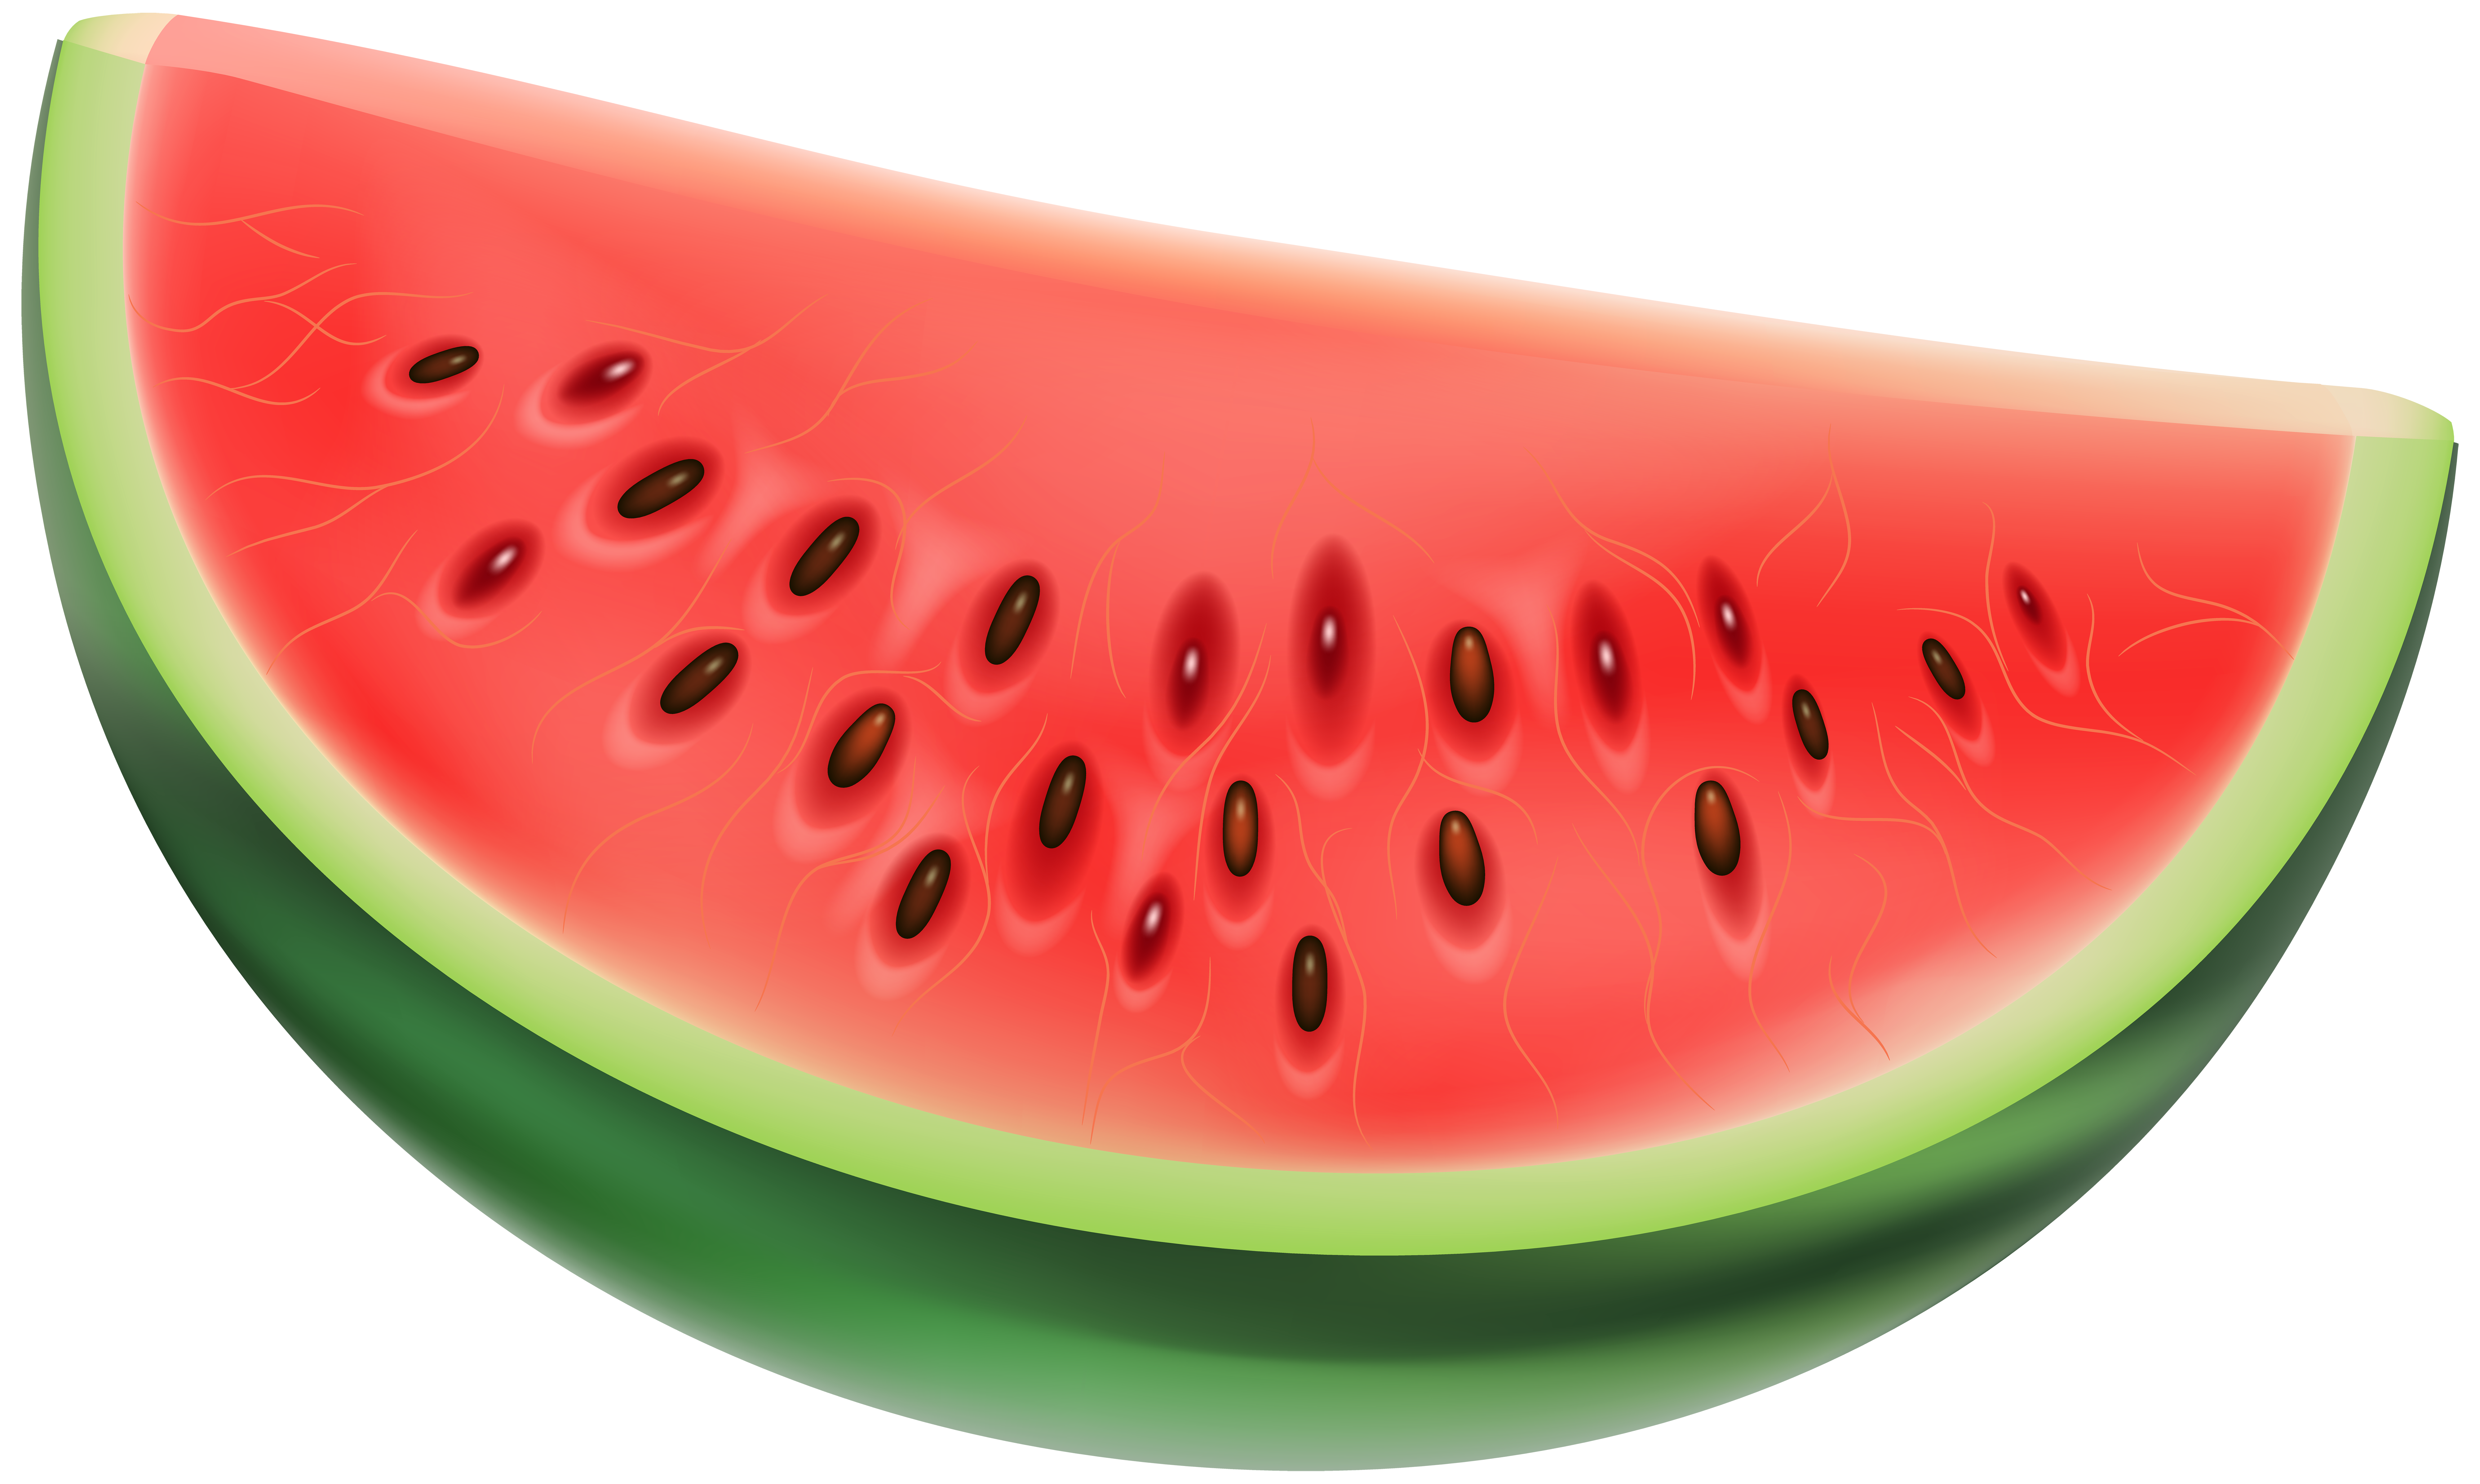 Watermelon clipart eye. Png best web